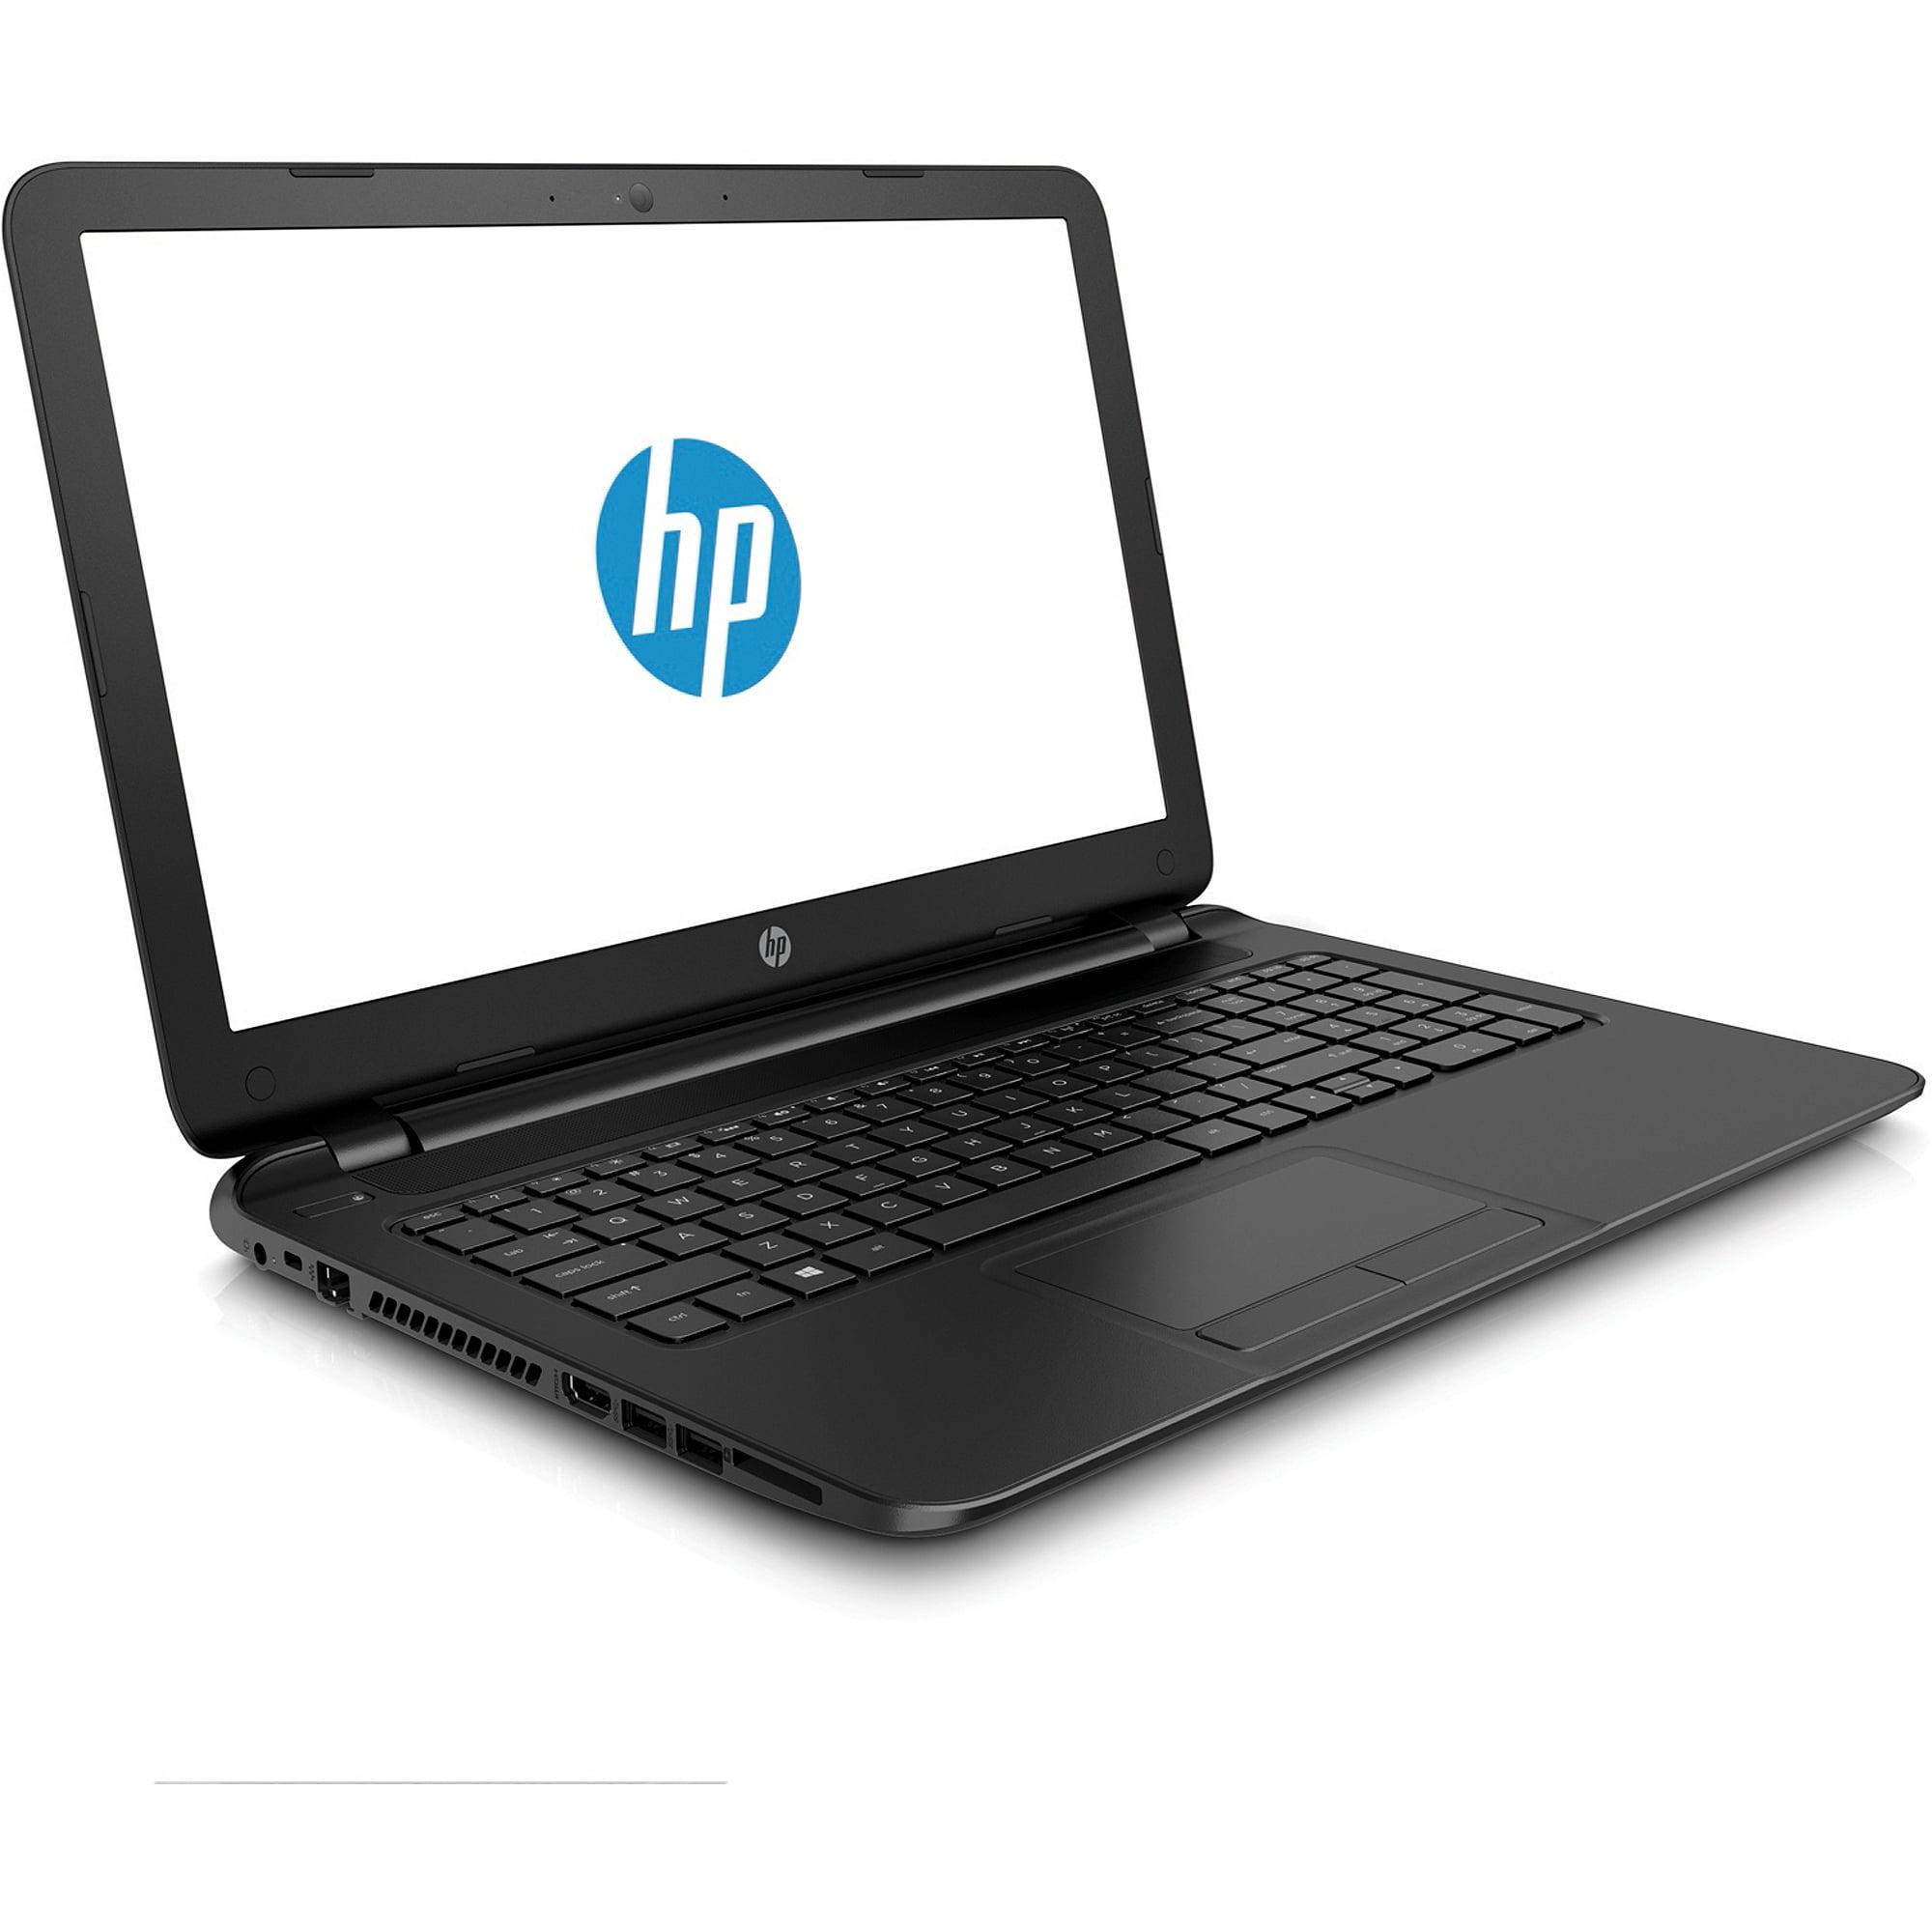 Hp notebook images - Hp J8x12ua 15 F039wm Notebook Pc Intel Celeron N2830 2 16 Ghz Dual Core